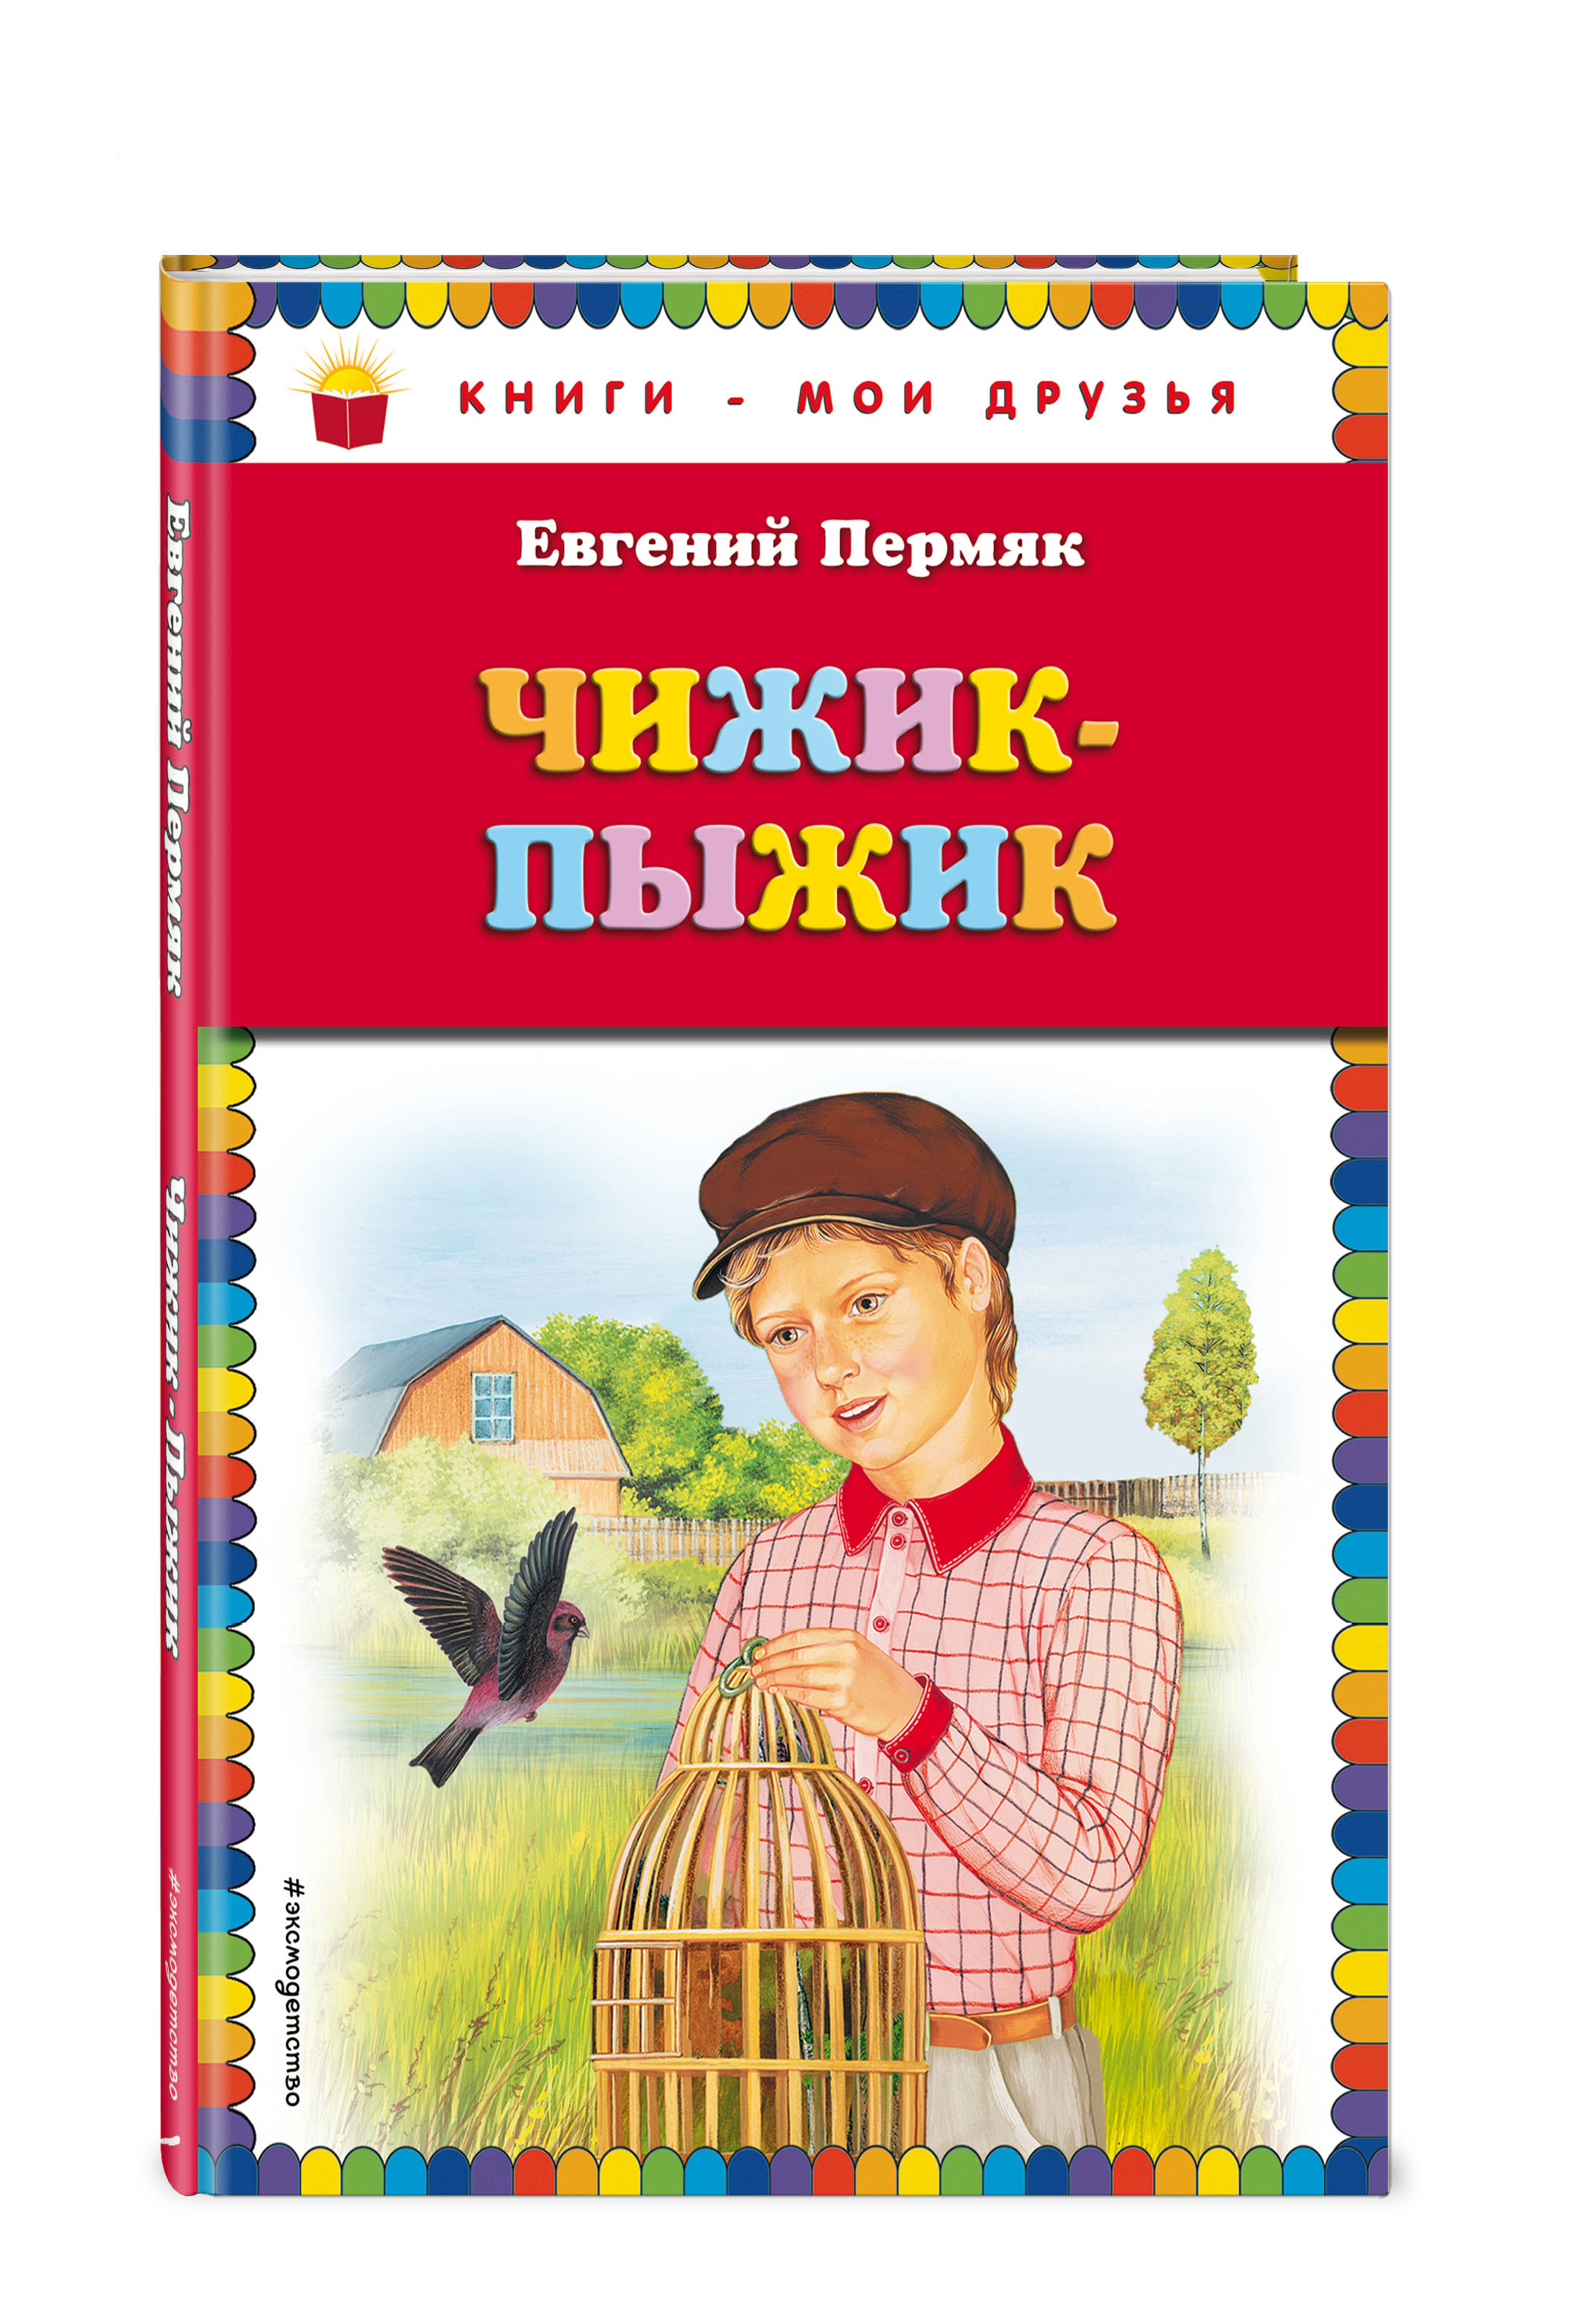 Евгений Пермяк Чижик-Пыжик евгений пермяк далматова фартуната